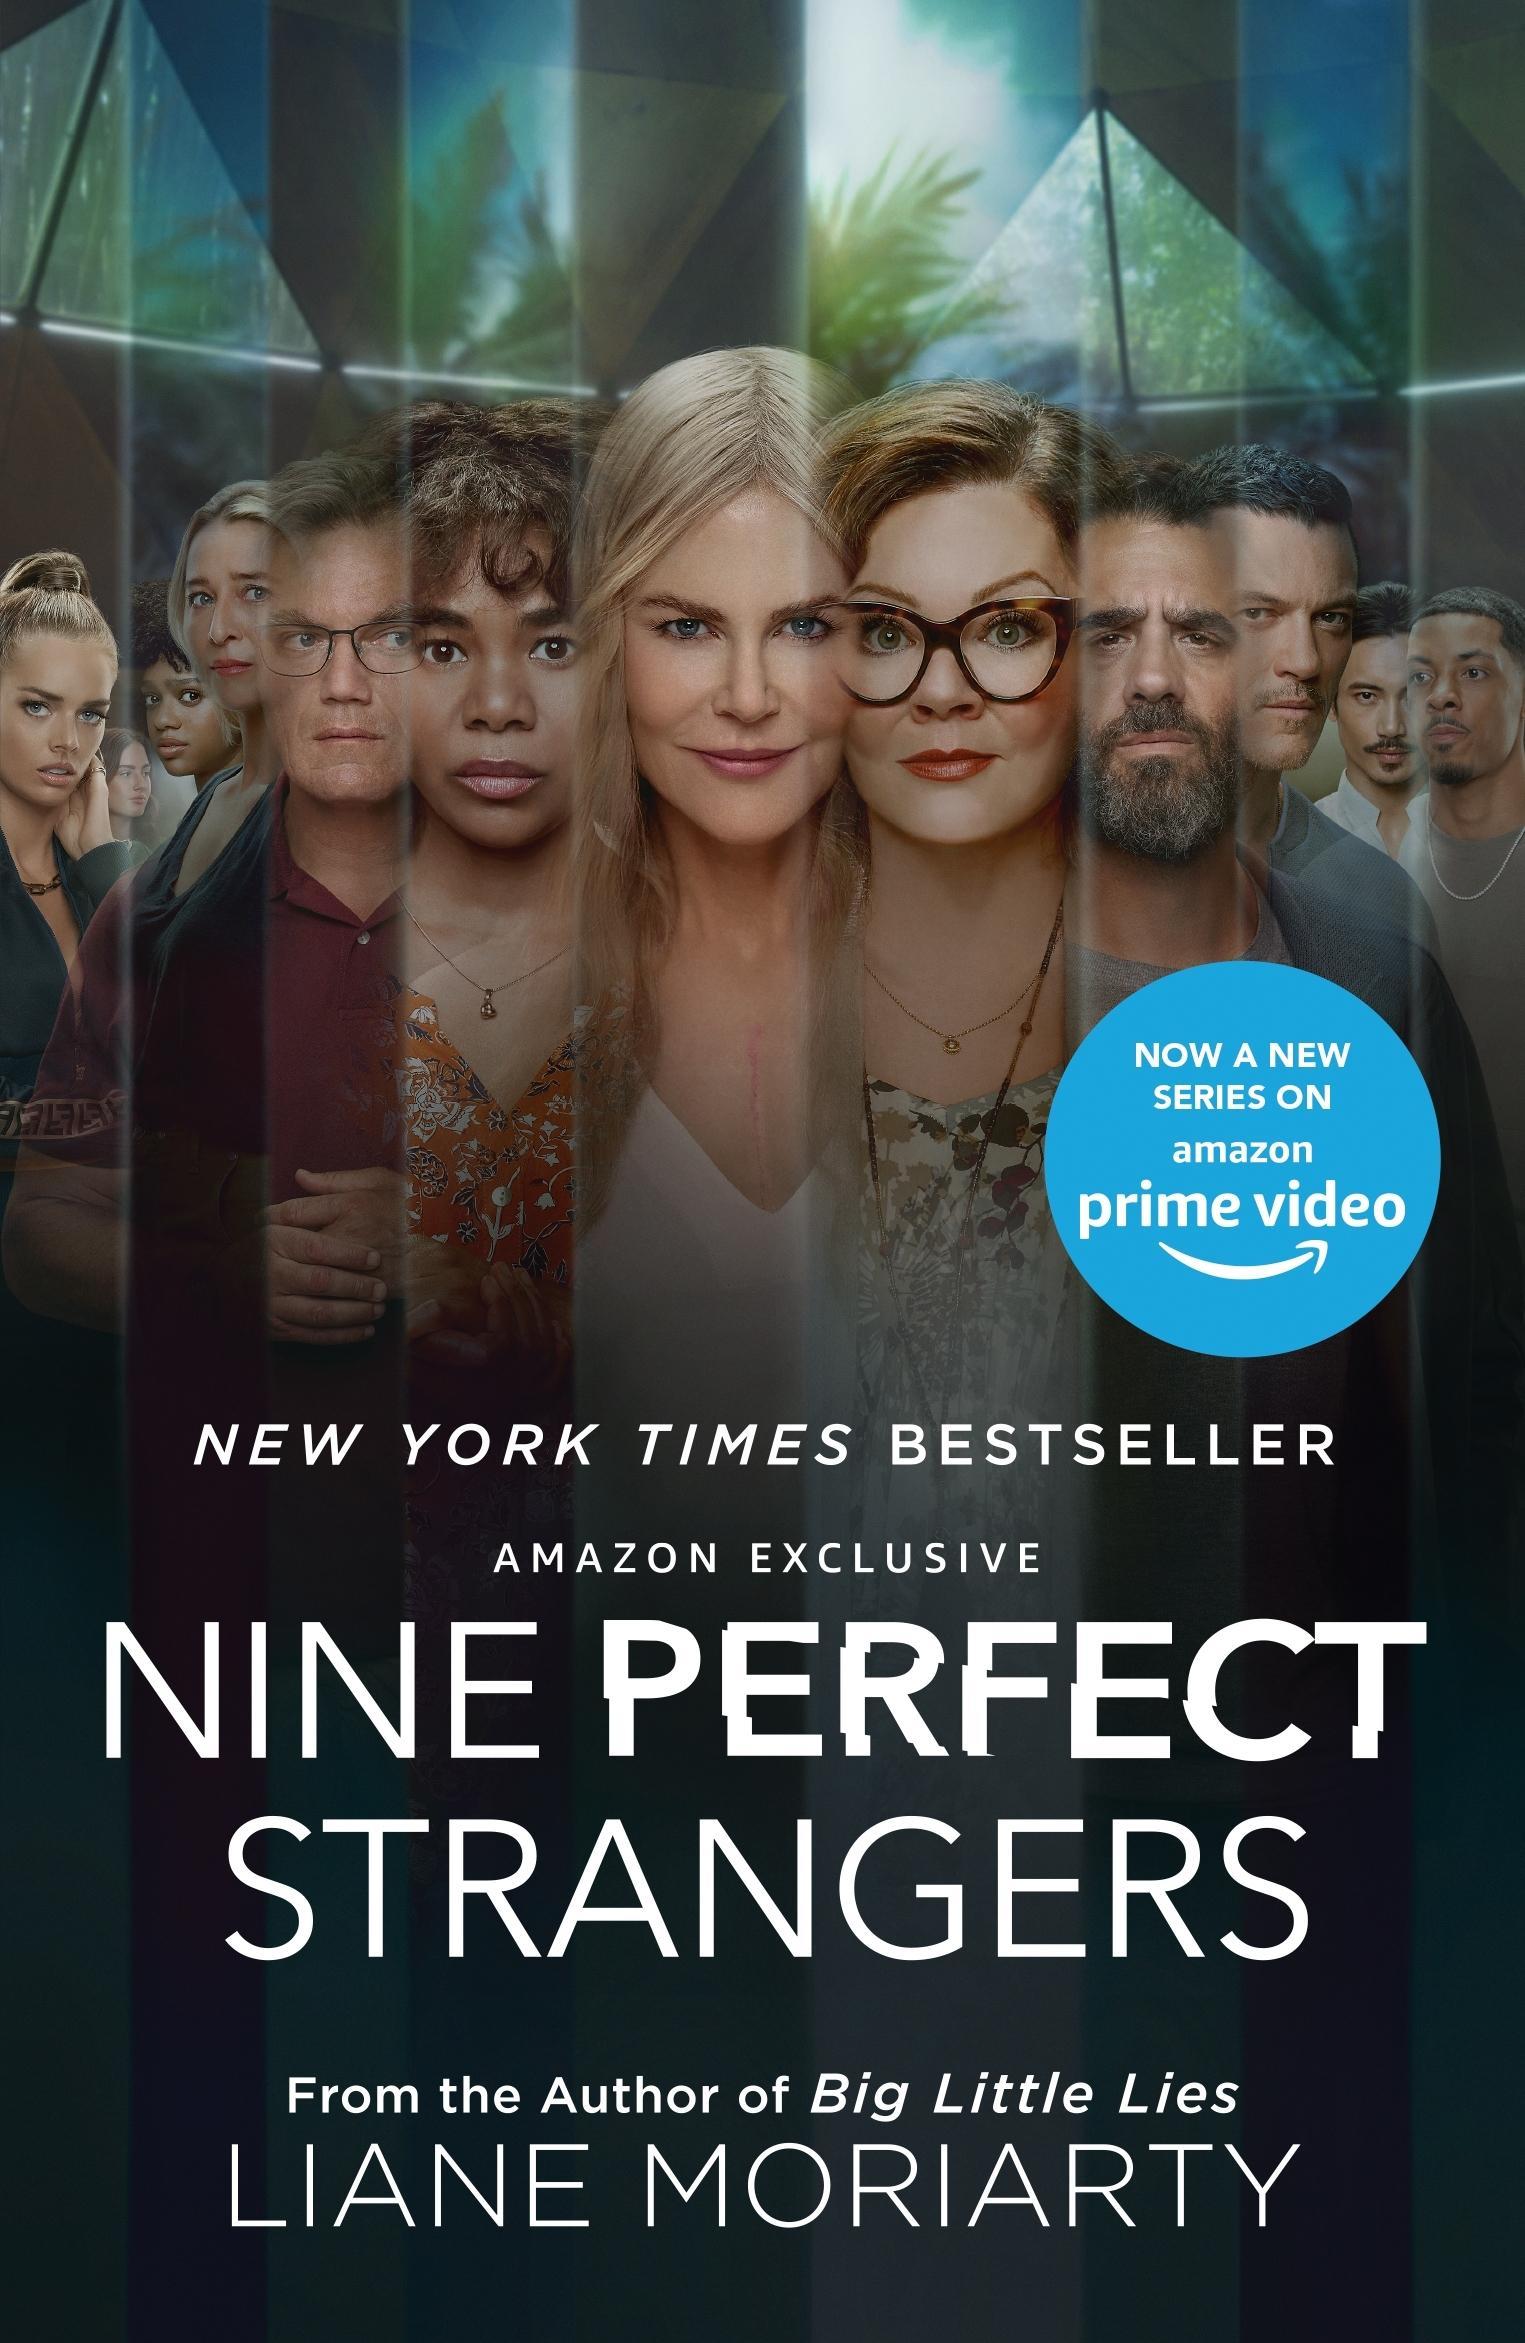 NinePerfectStrangers